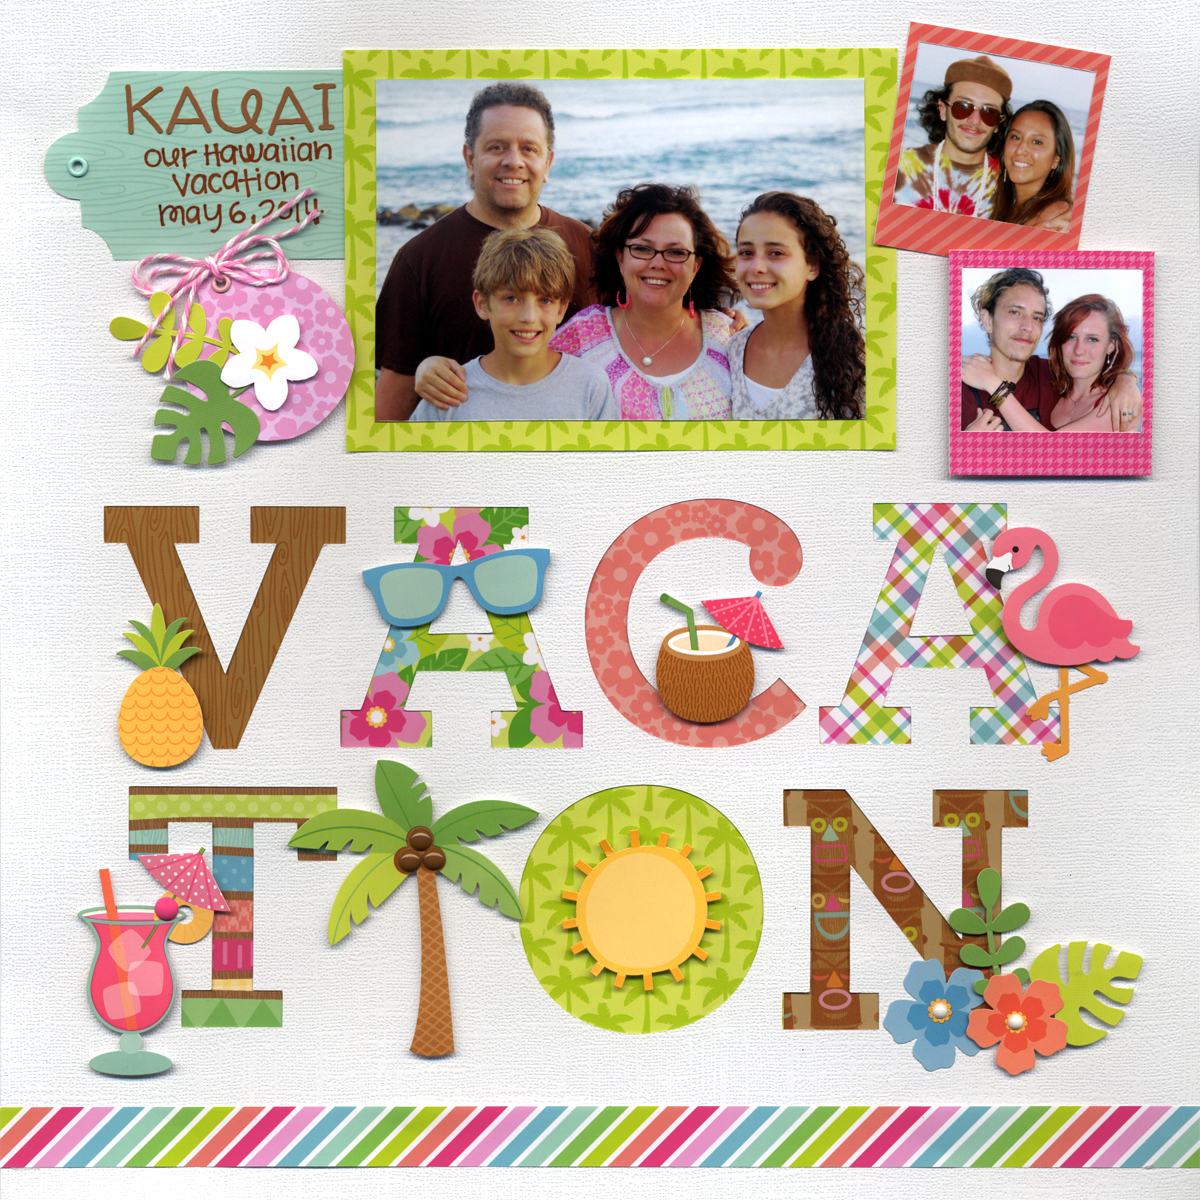 Summer vacation scrapbook ideas - Tuesday May 17 2016